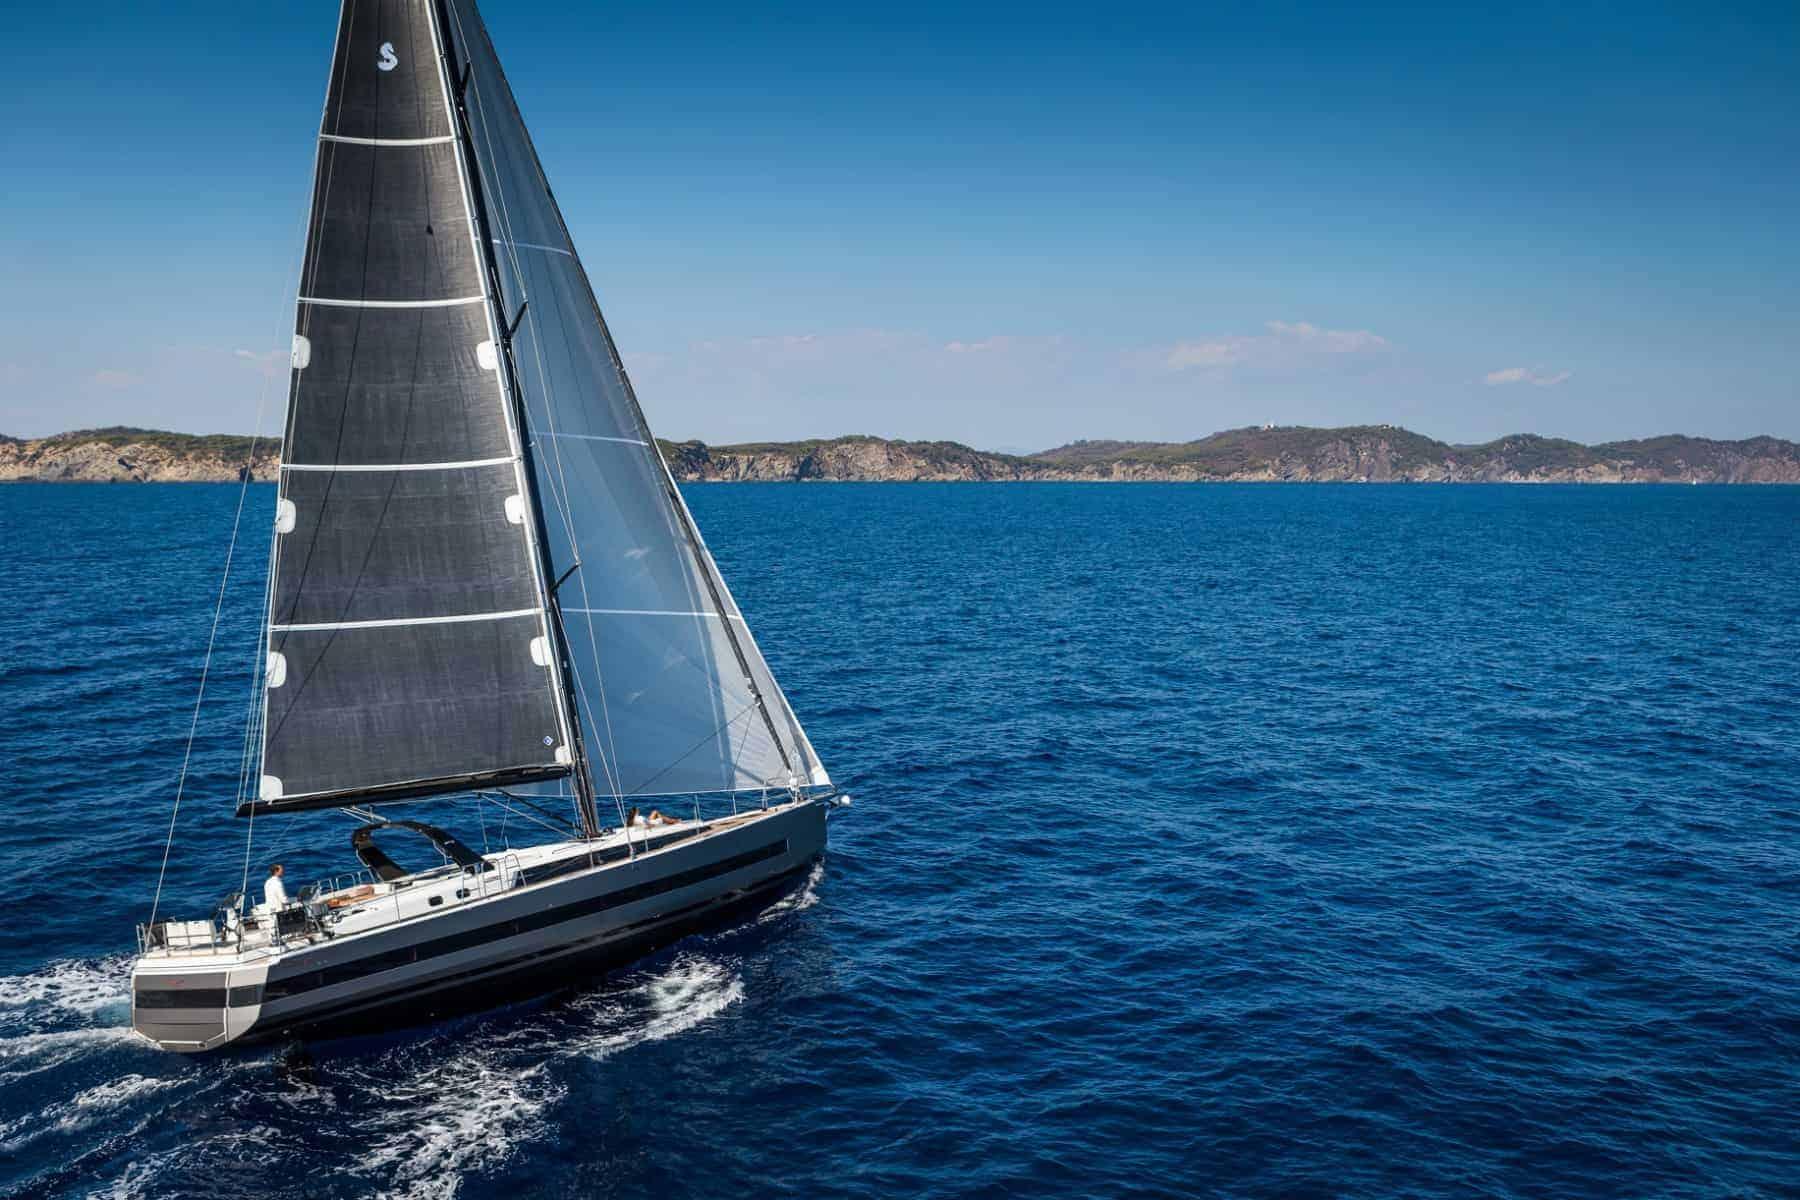 The Beneteau Oceanis Yacht 62 speeding through the calm waves towards the horizon